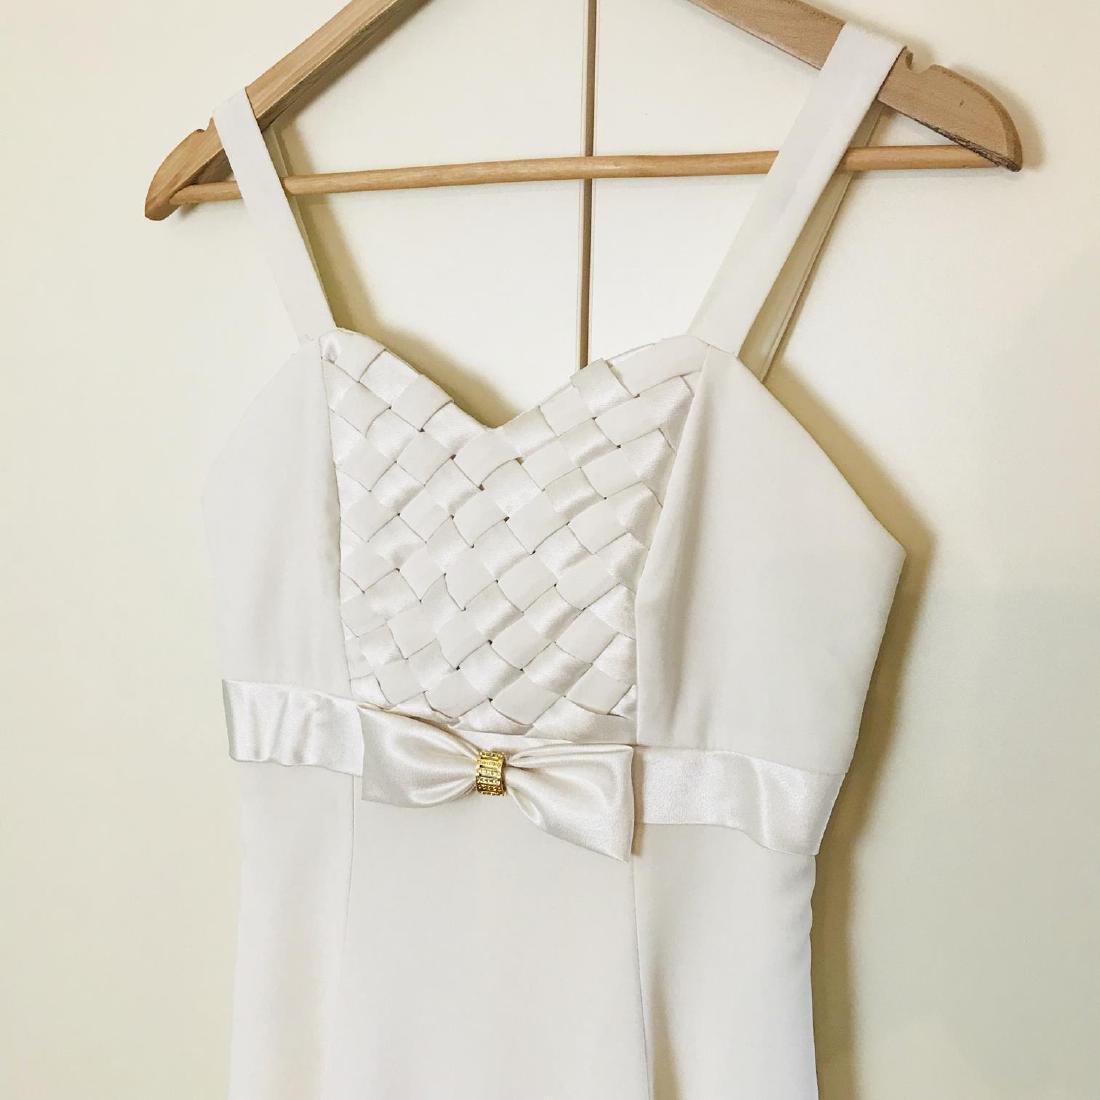 Vintage Women's White Designer Dress Size US 8 EUR 38 - 3